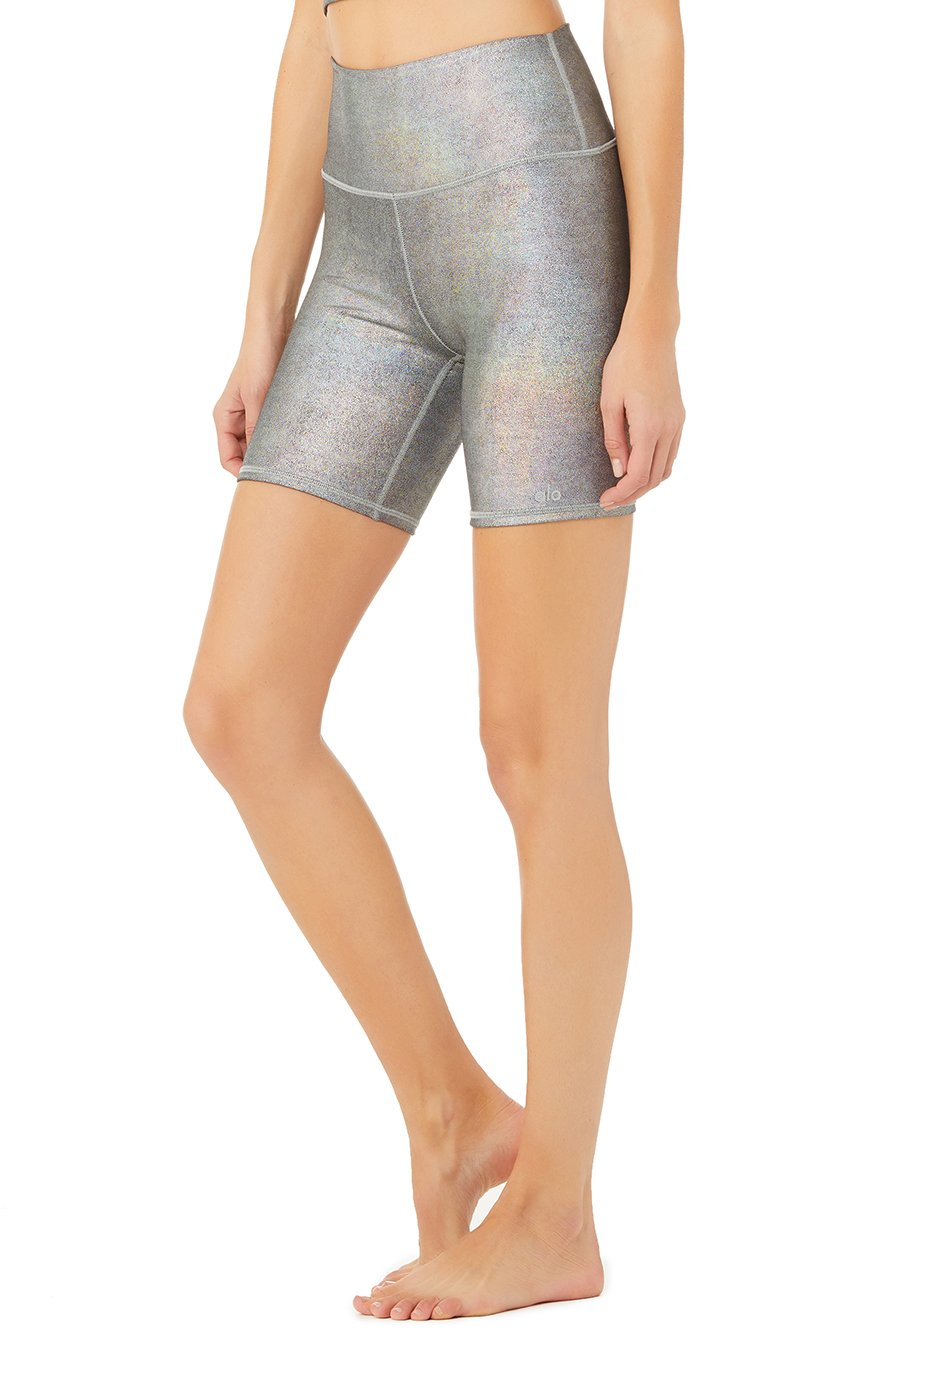 Alo yoga biker shorts